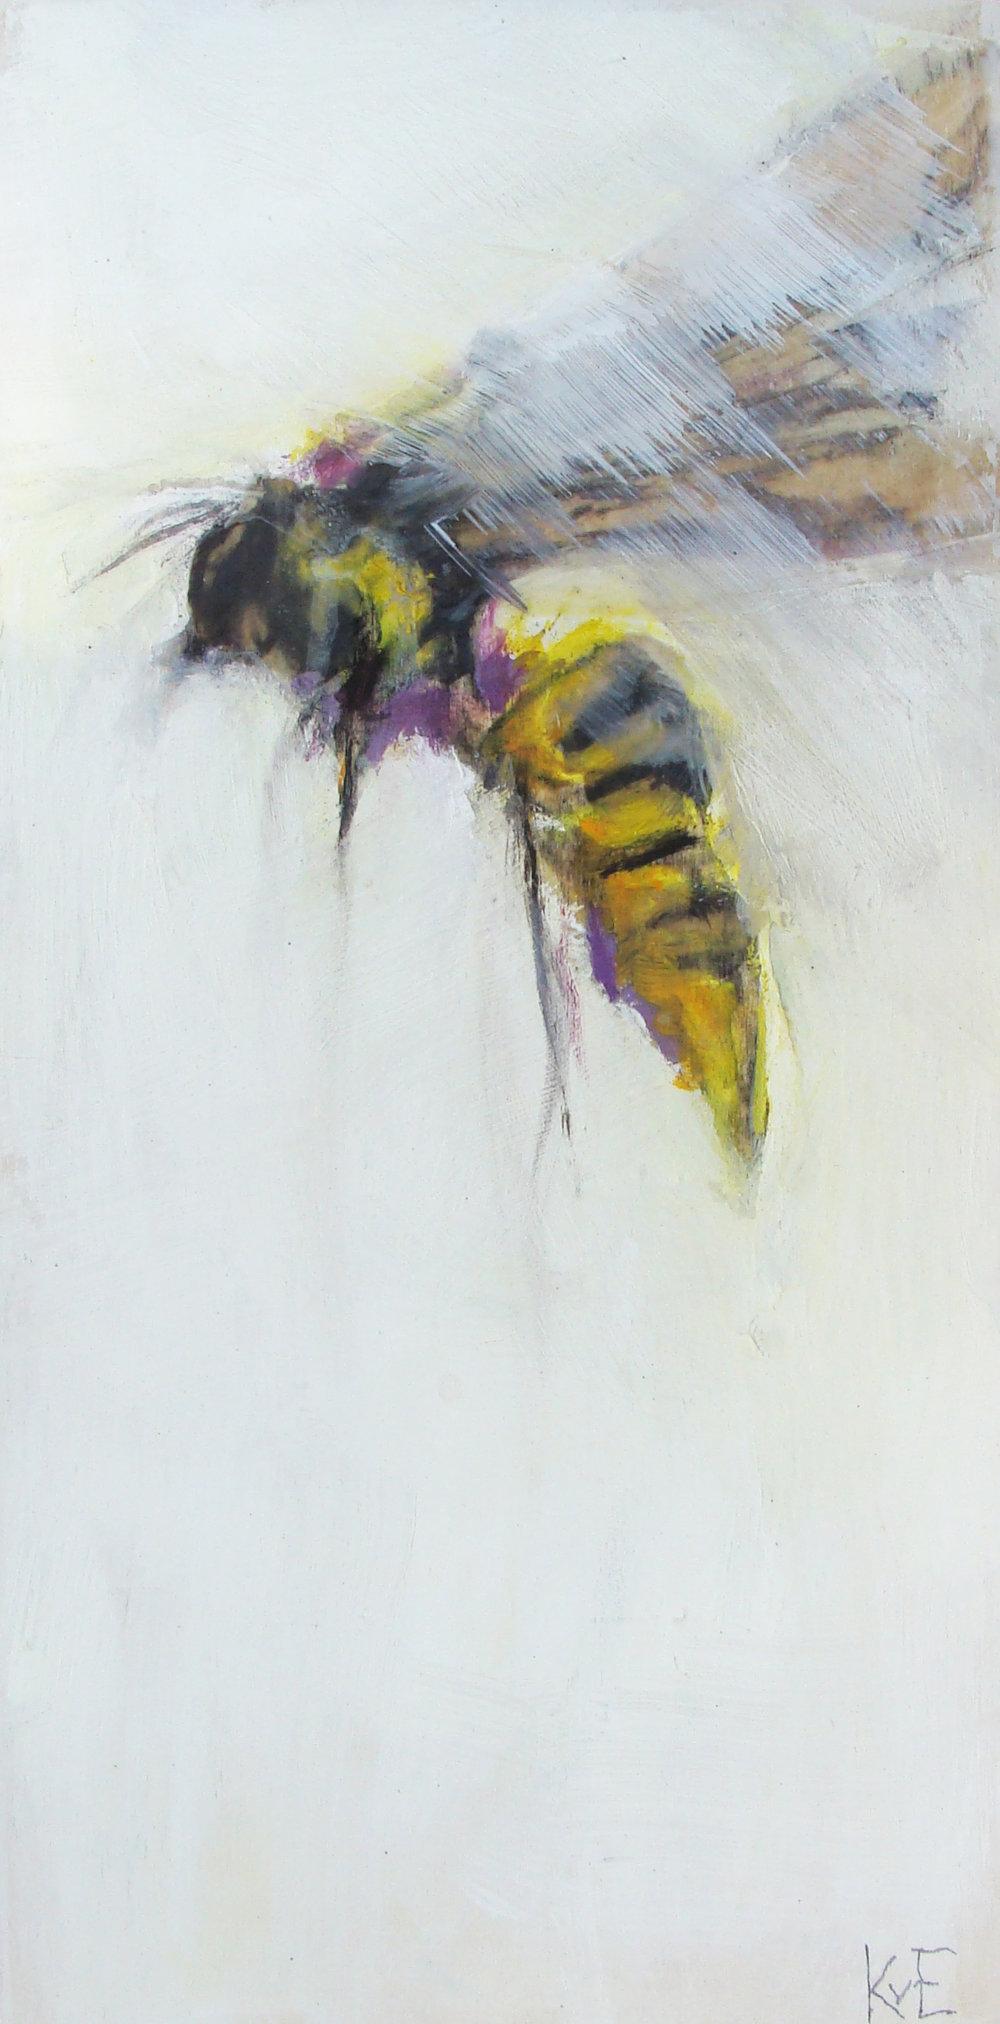 "Tiny's bee 2 - 12x6"", oil, mixed media panel, 2017,  SOLD"